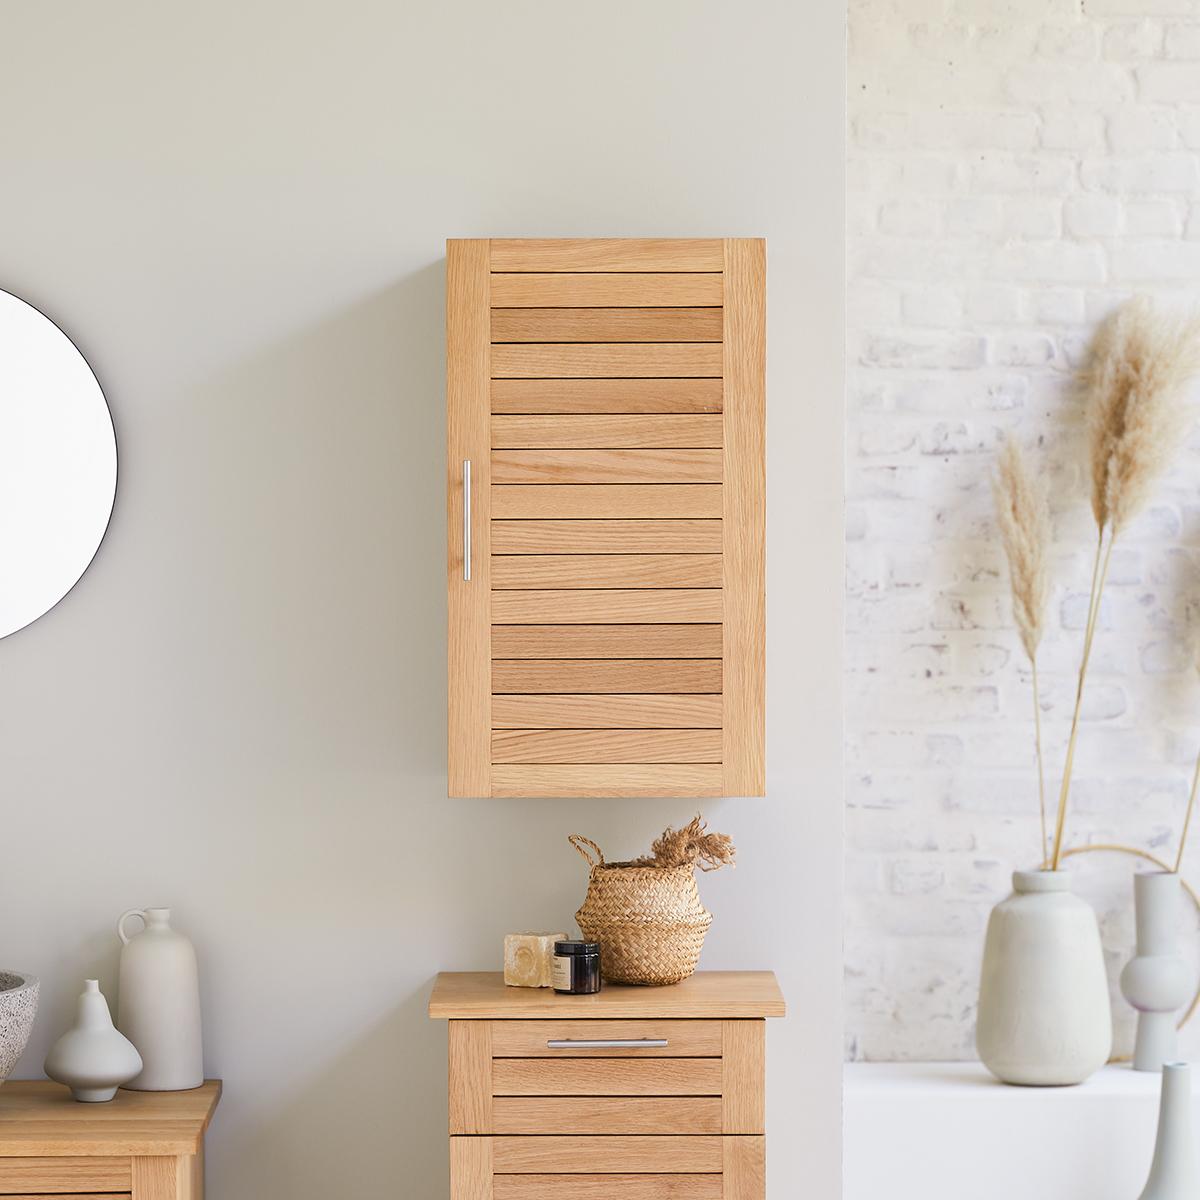 Soho solid oak Wall unit